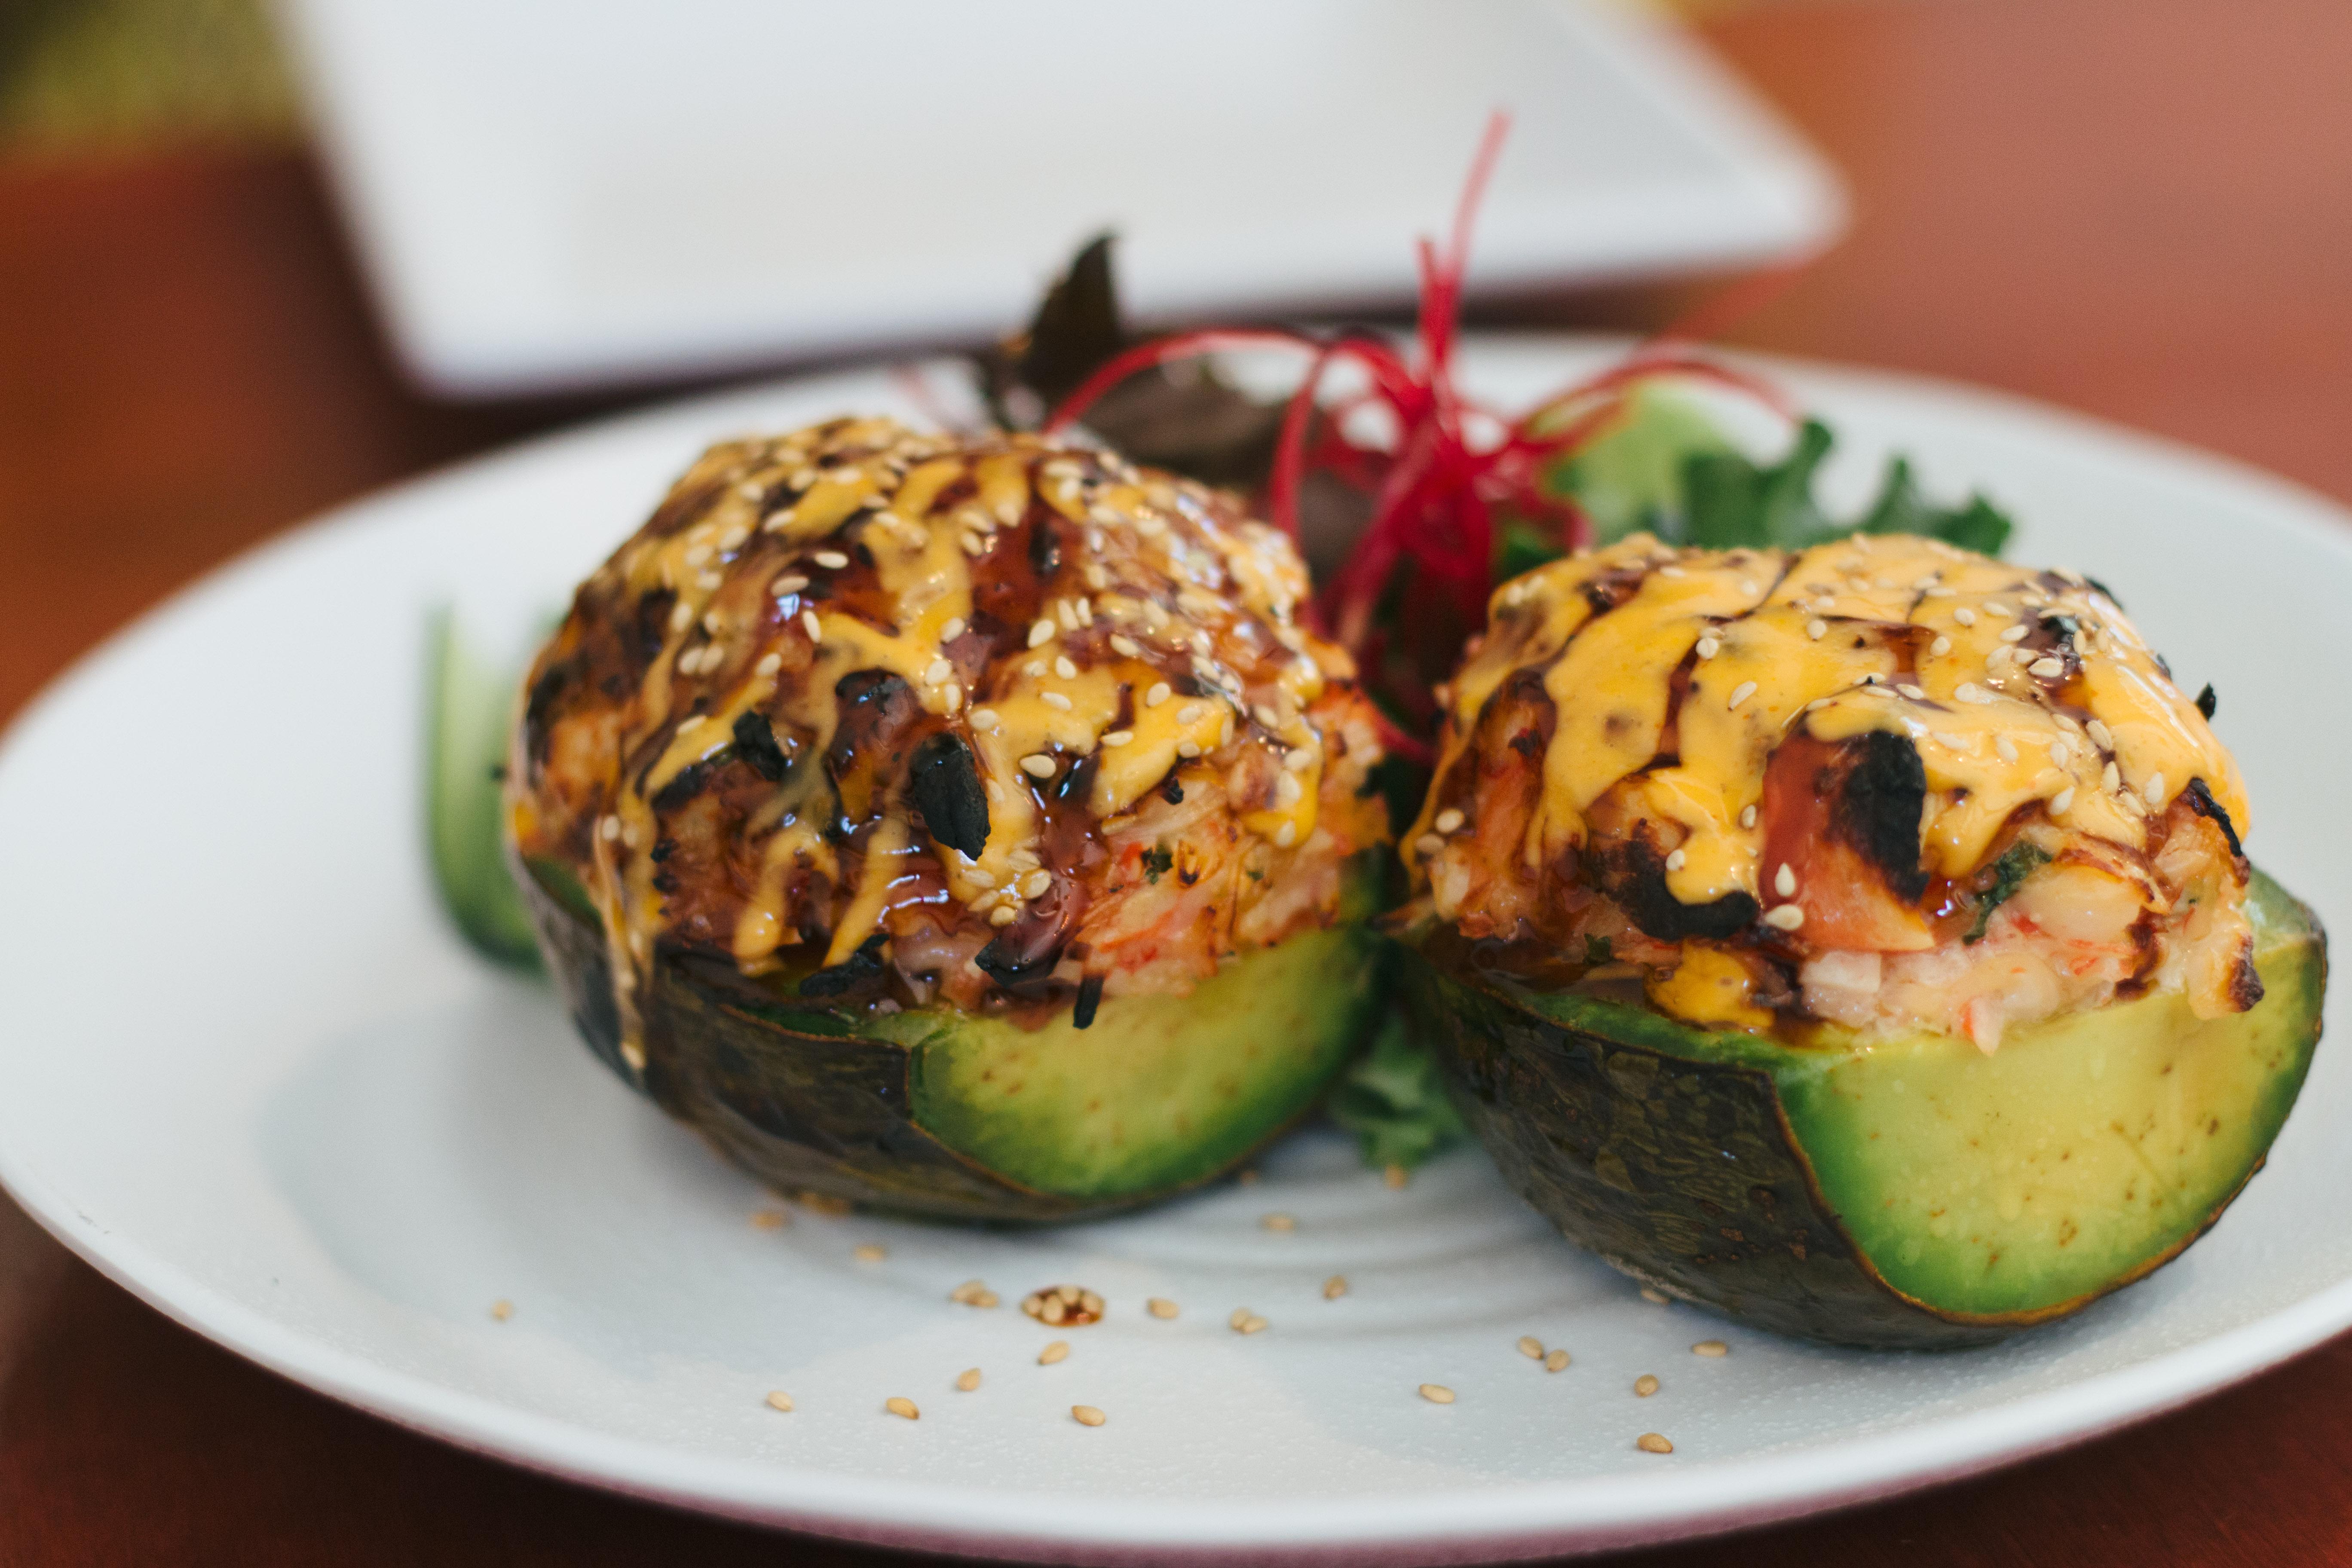 Fast Break Ava Street Caf 233 Offers A Filling Vietnamese Lunch